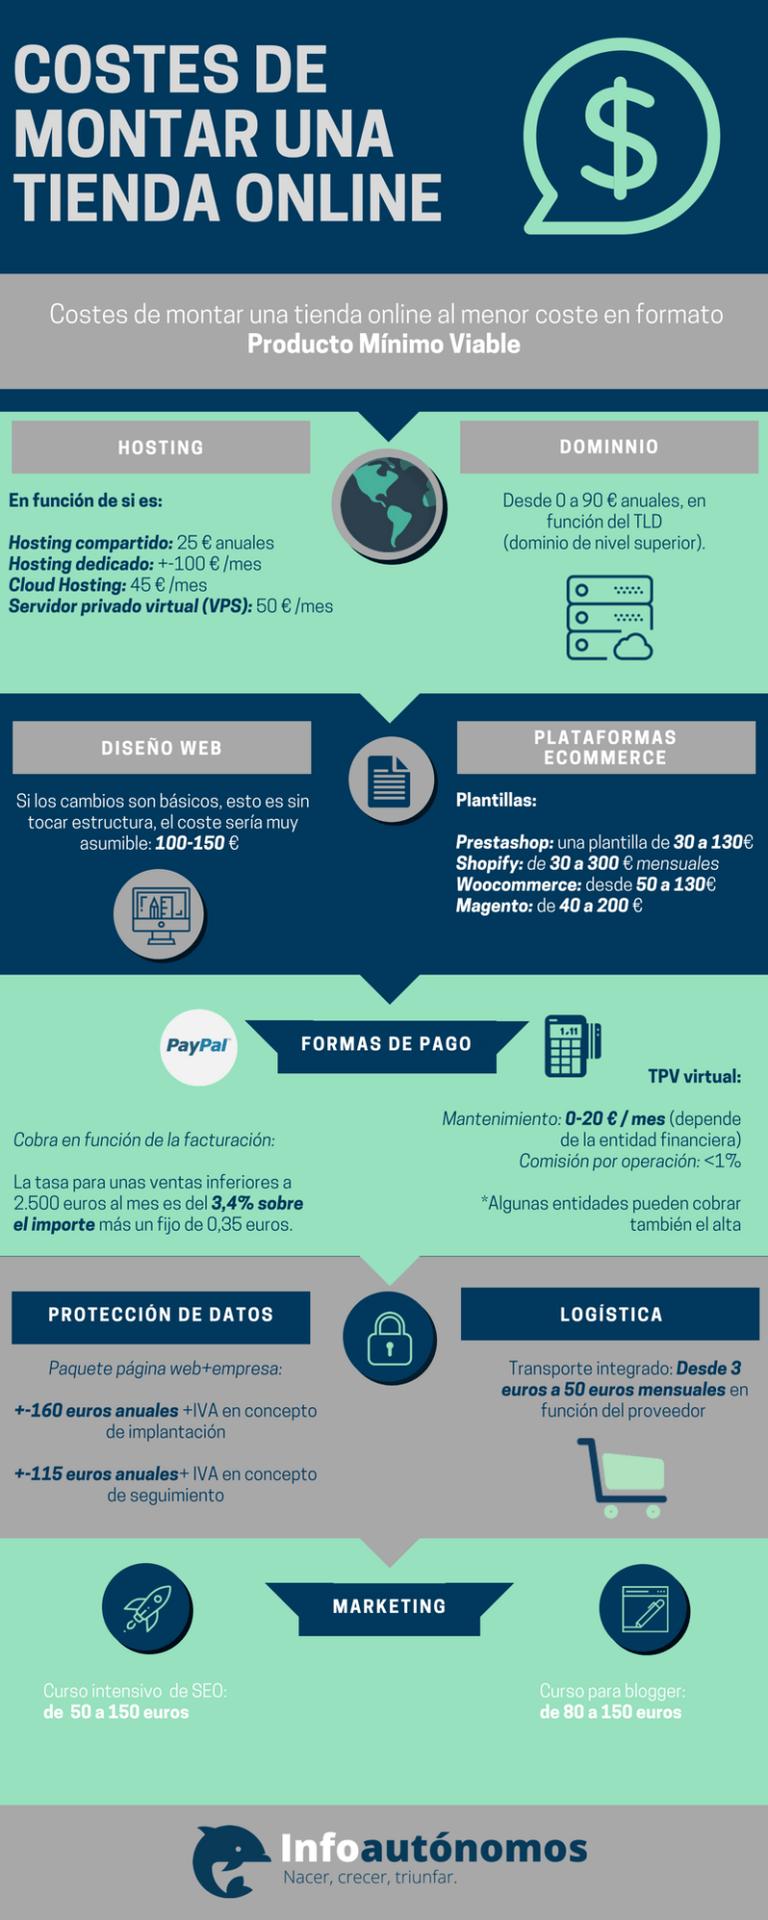 Coste de una tienda online #infografia #infographic #ecommerce